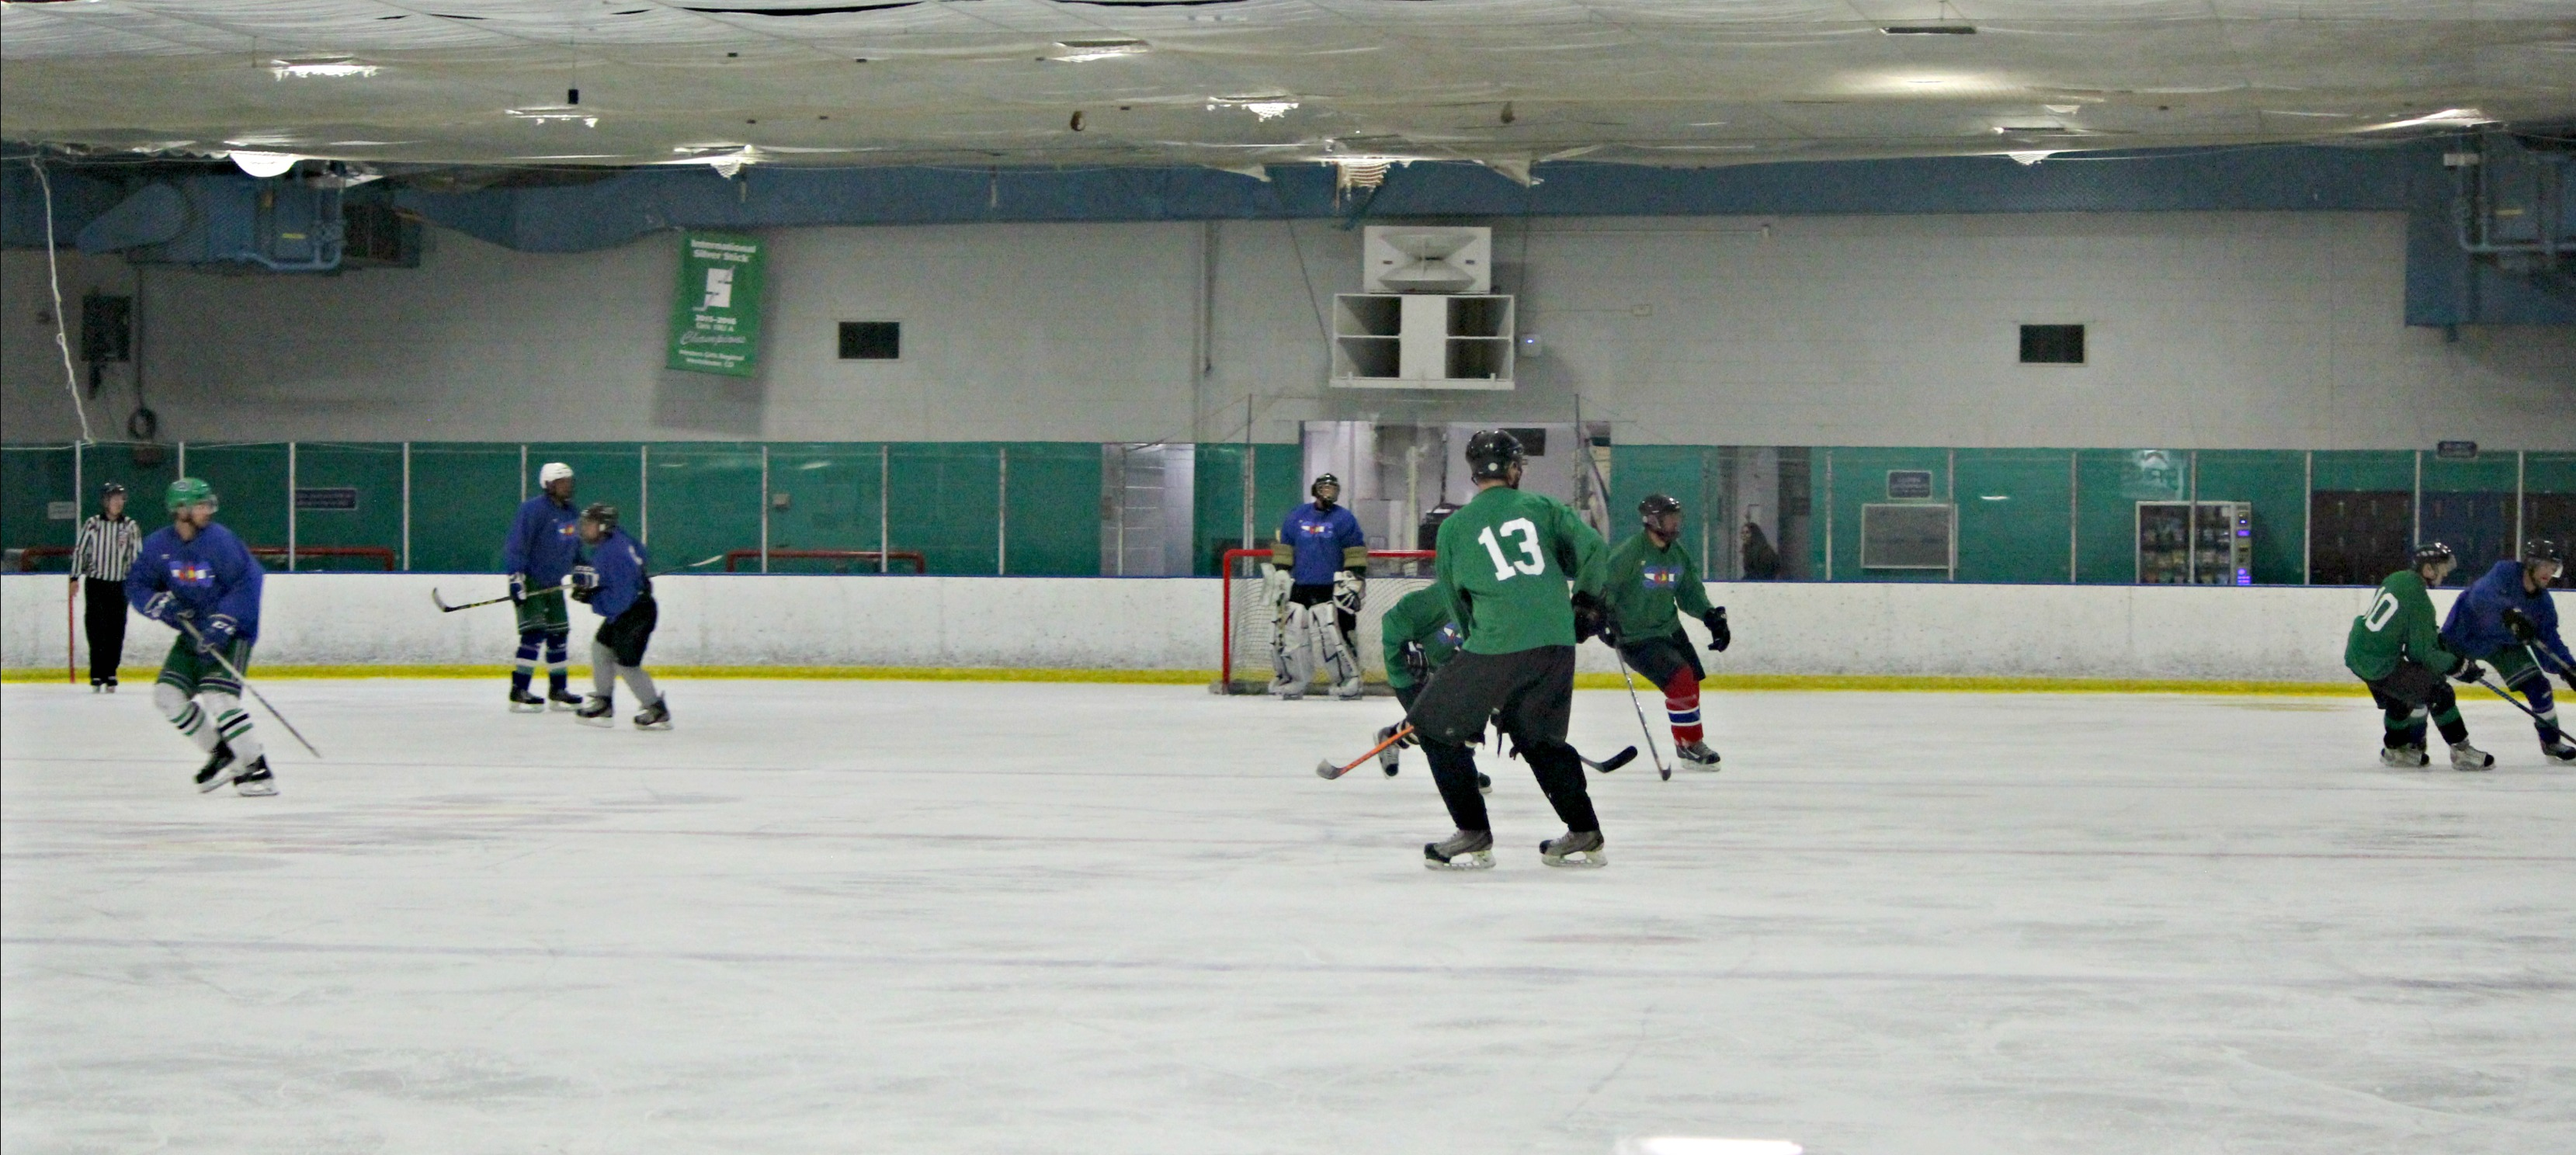 Hockey At Sertich Ice Center Colorado Springs